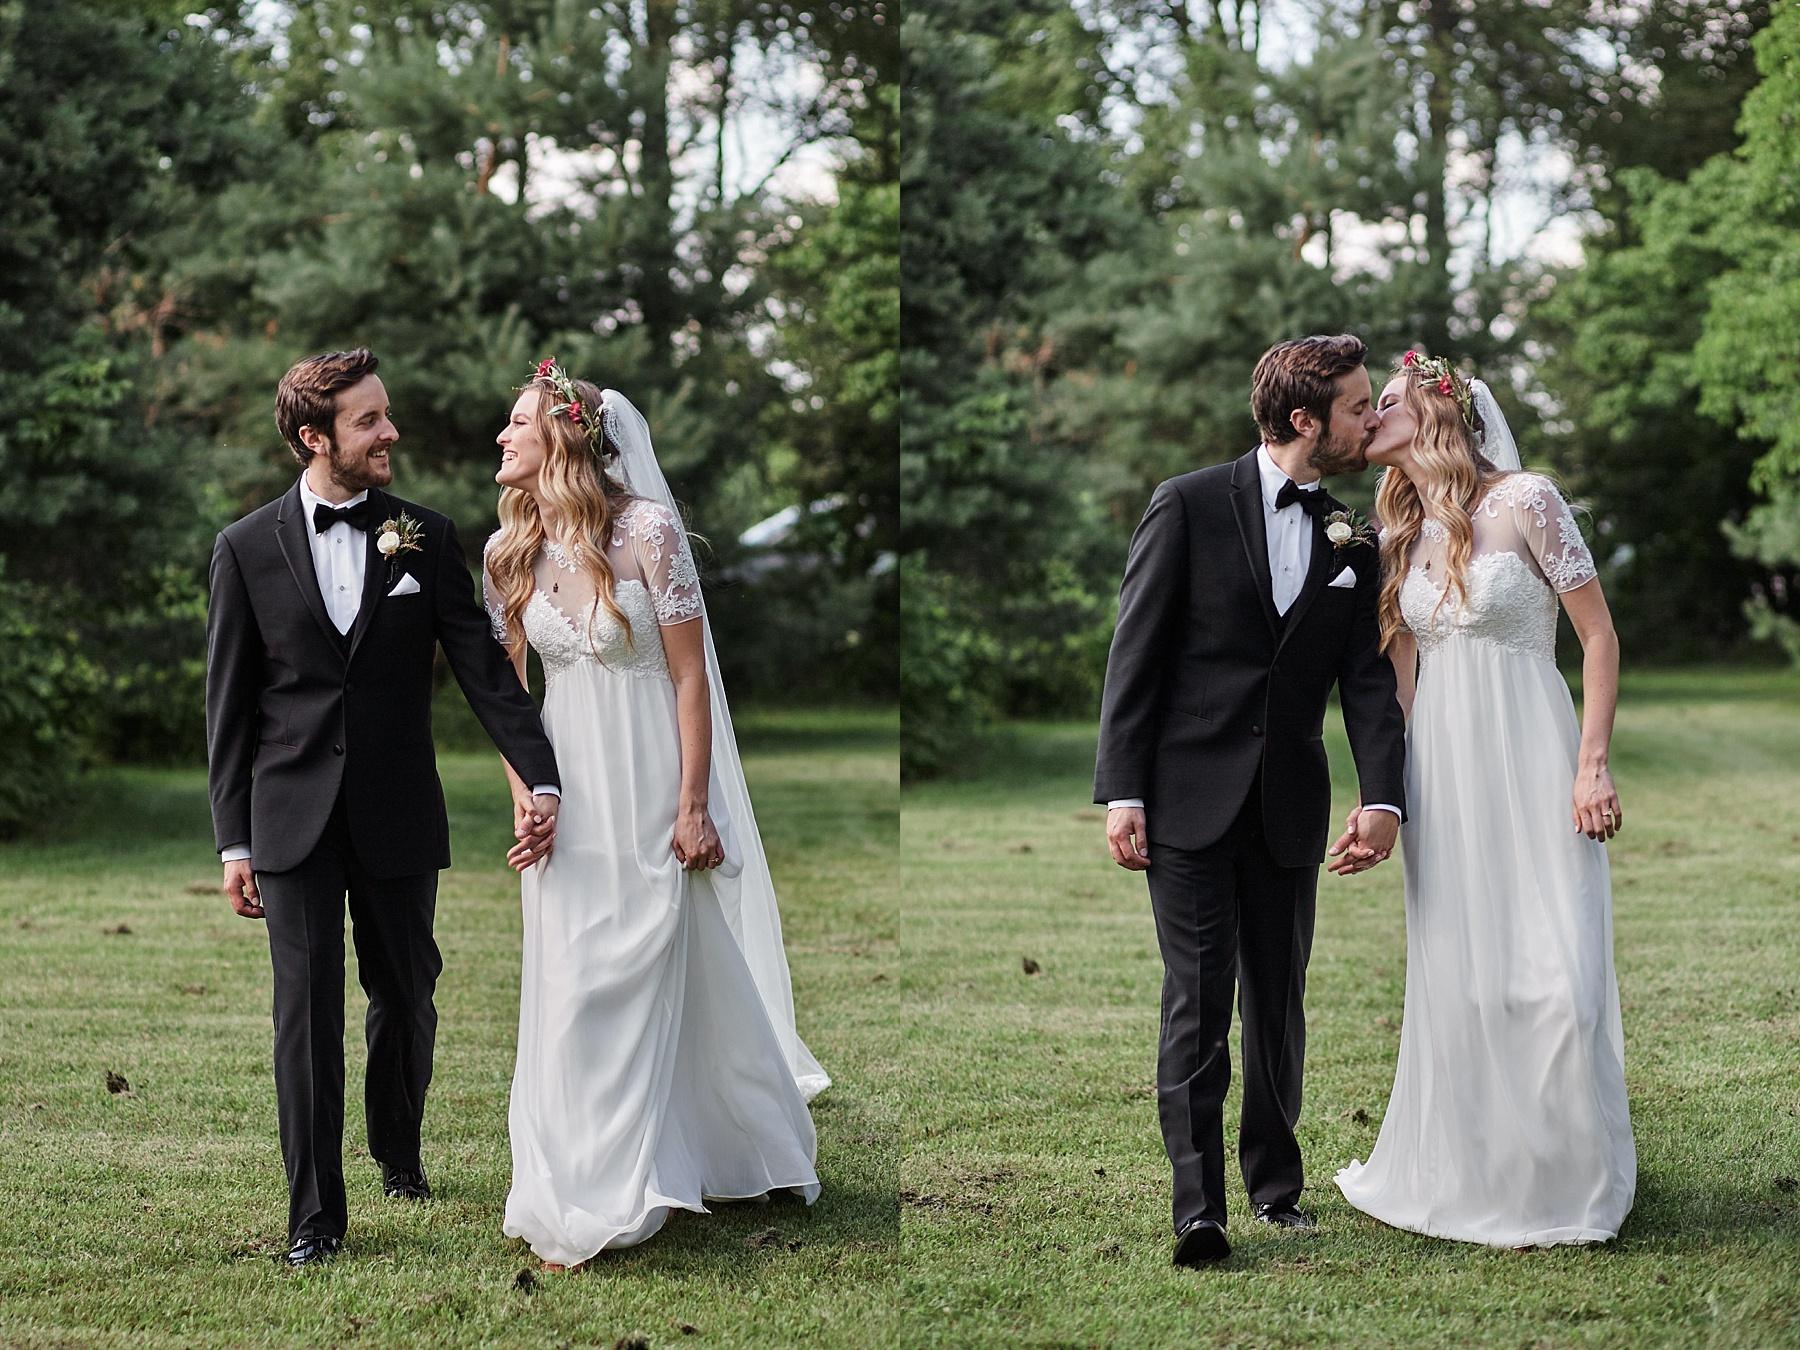 Fairhaven-Farm-South-Haven-Minnesota-Barn-Outdoor-Wedding-Josh-Kailey_0948.jpg